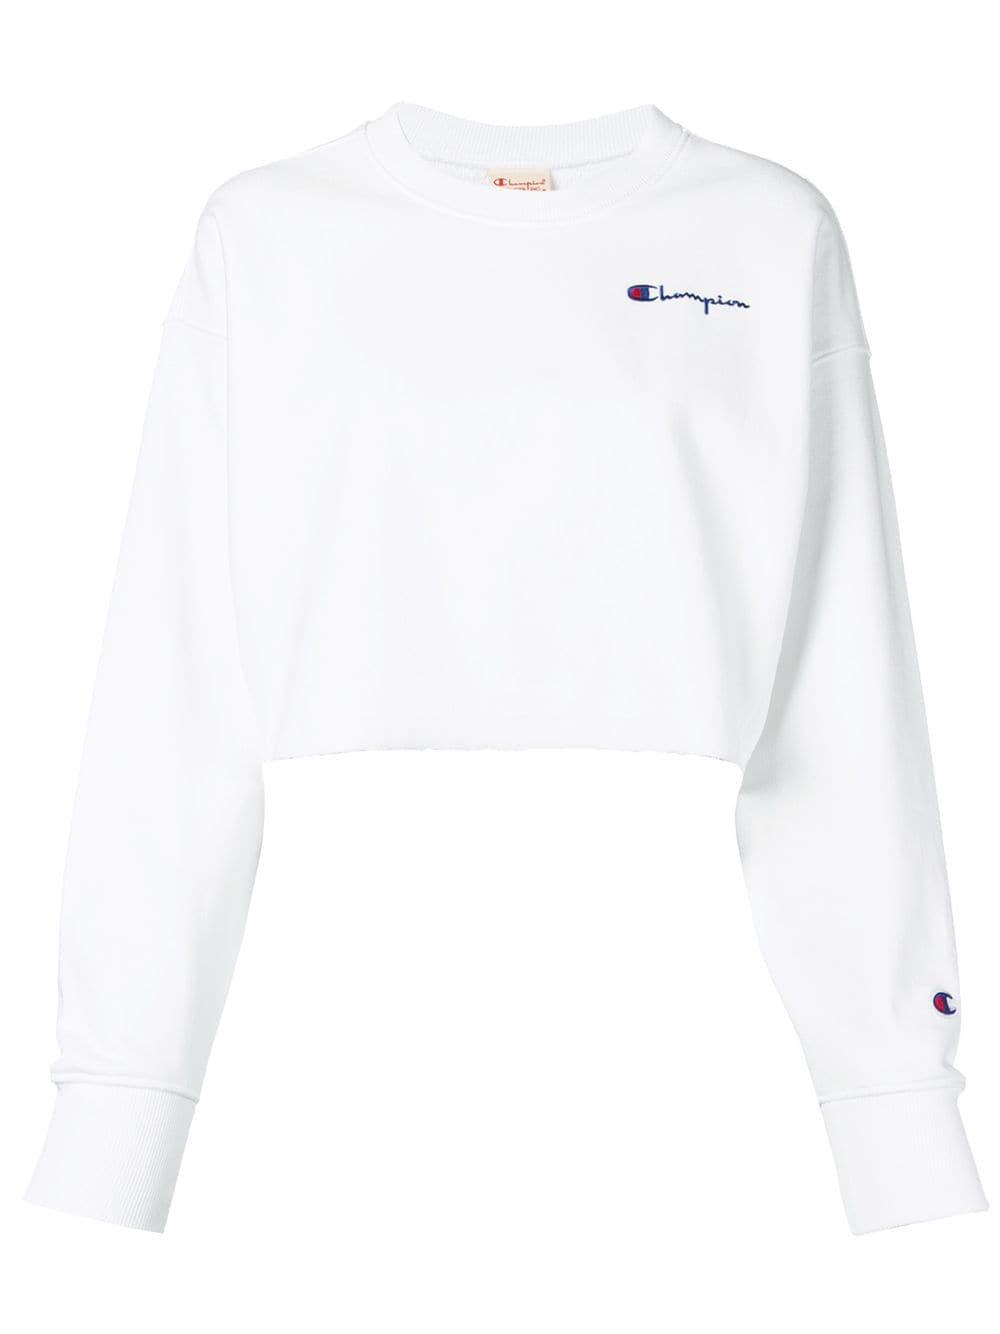 Champion Cropped Sweatshirt Farfetch Crop Sweatshirt Sweatshirts Cropped Sweatshirt Outfit [ 1334 x 1000 Pixel ]